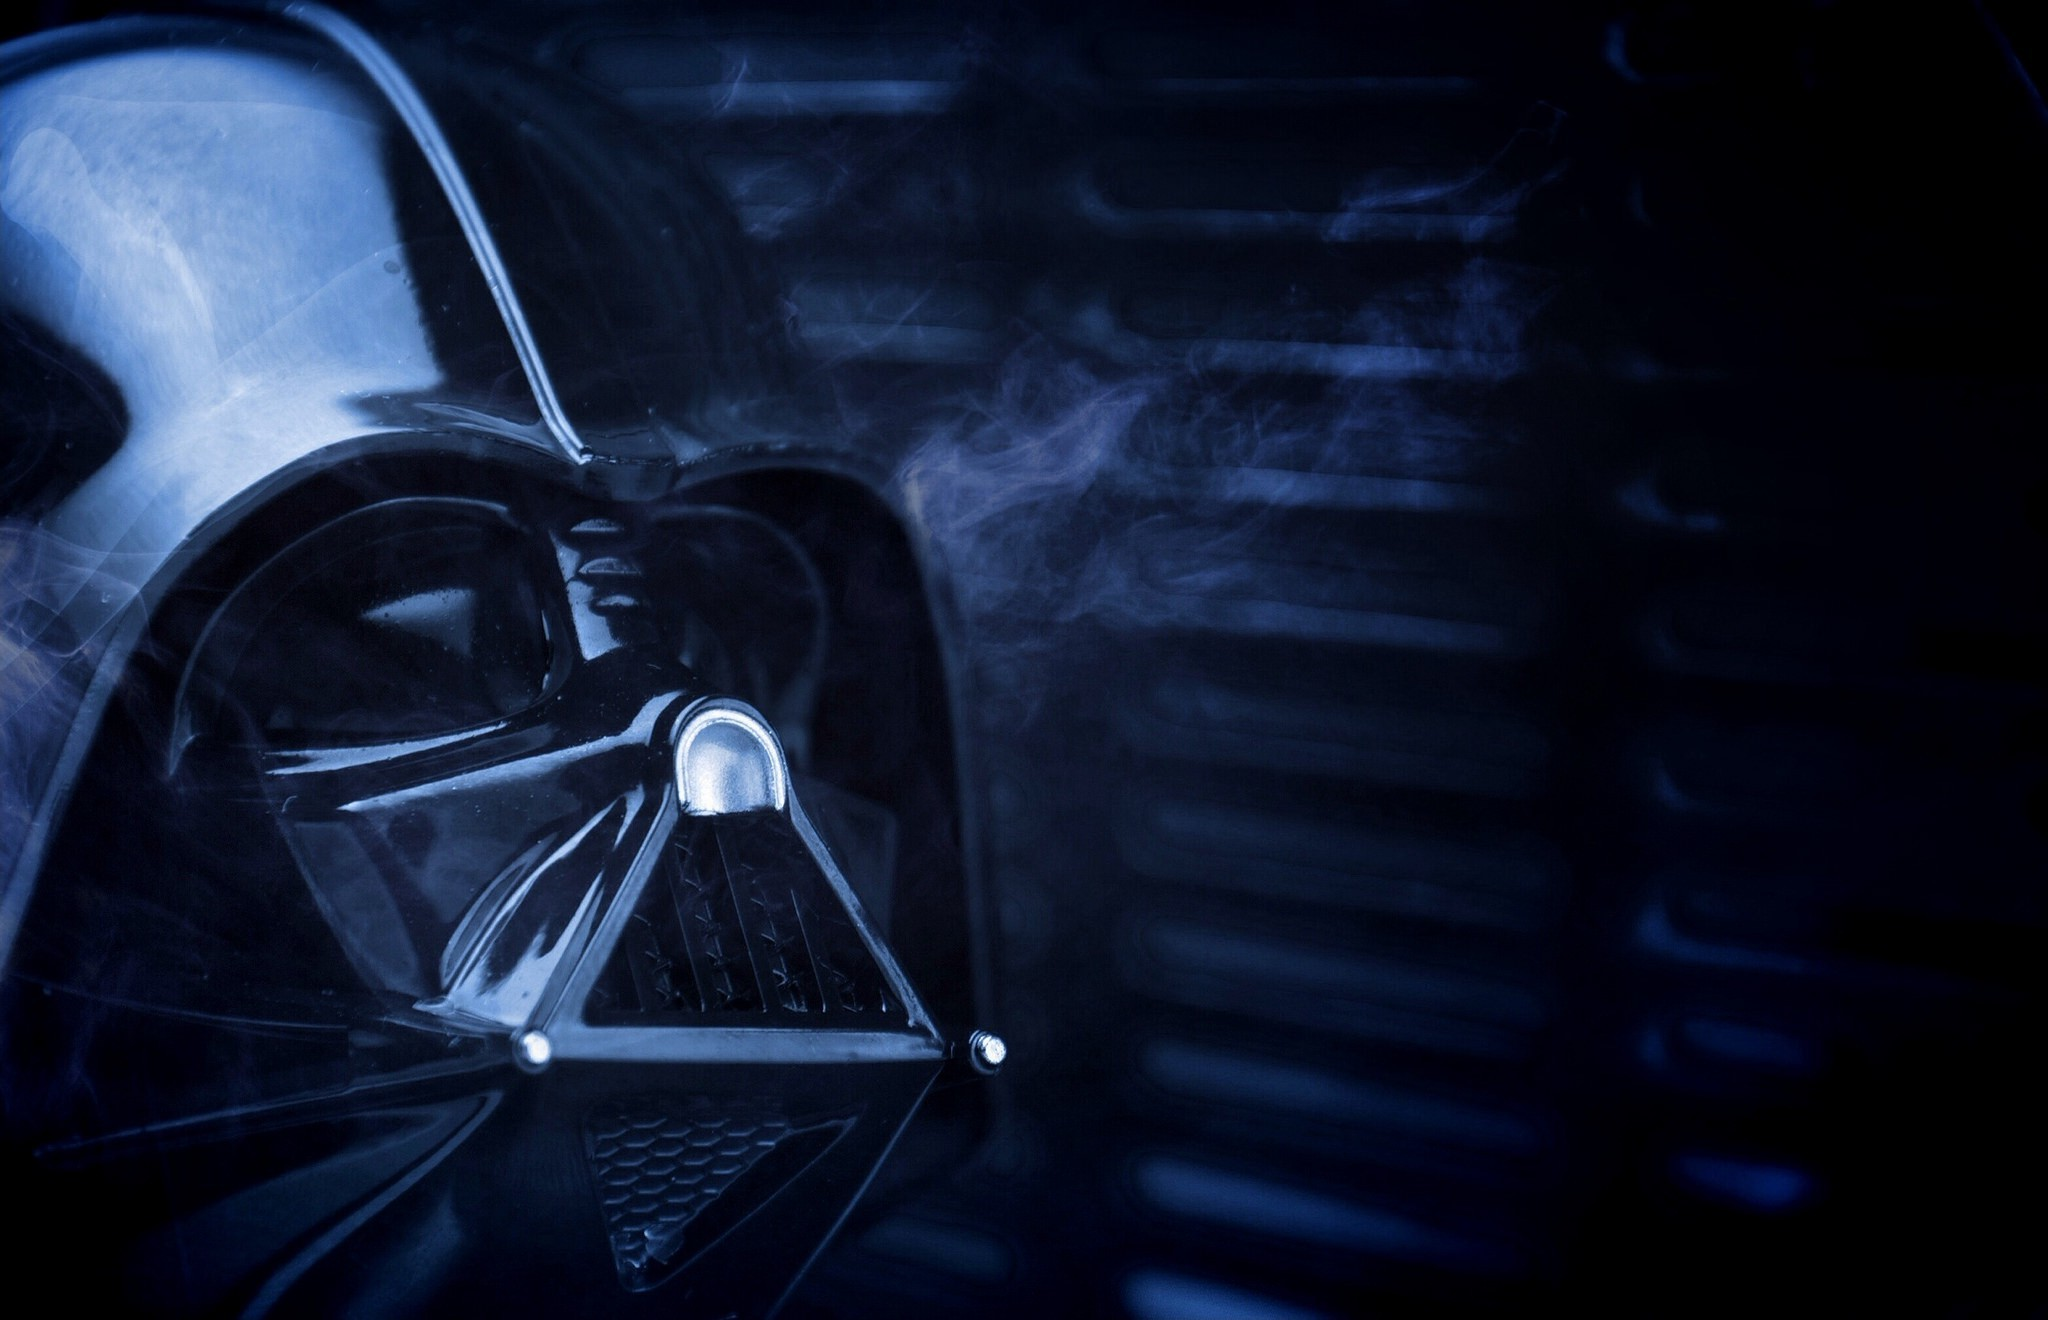 Darth Vader Wallpaper Iphone: Kylo Ren Mask Wallpaper (60+ Images